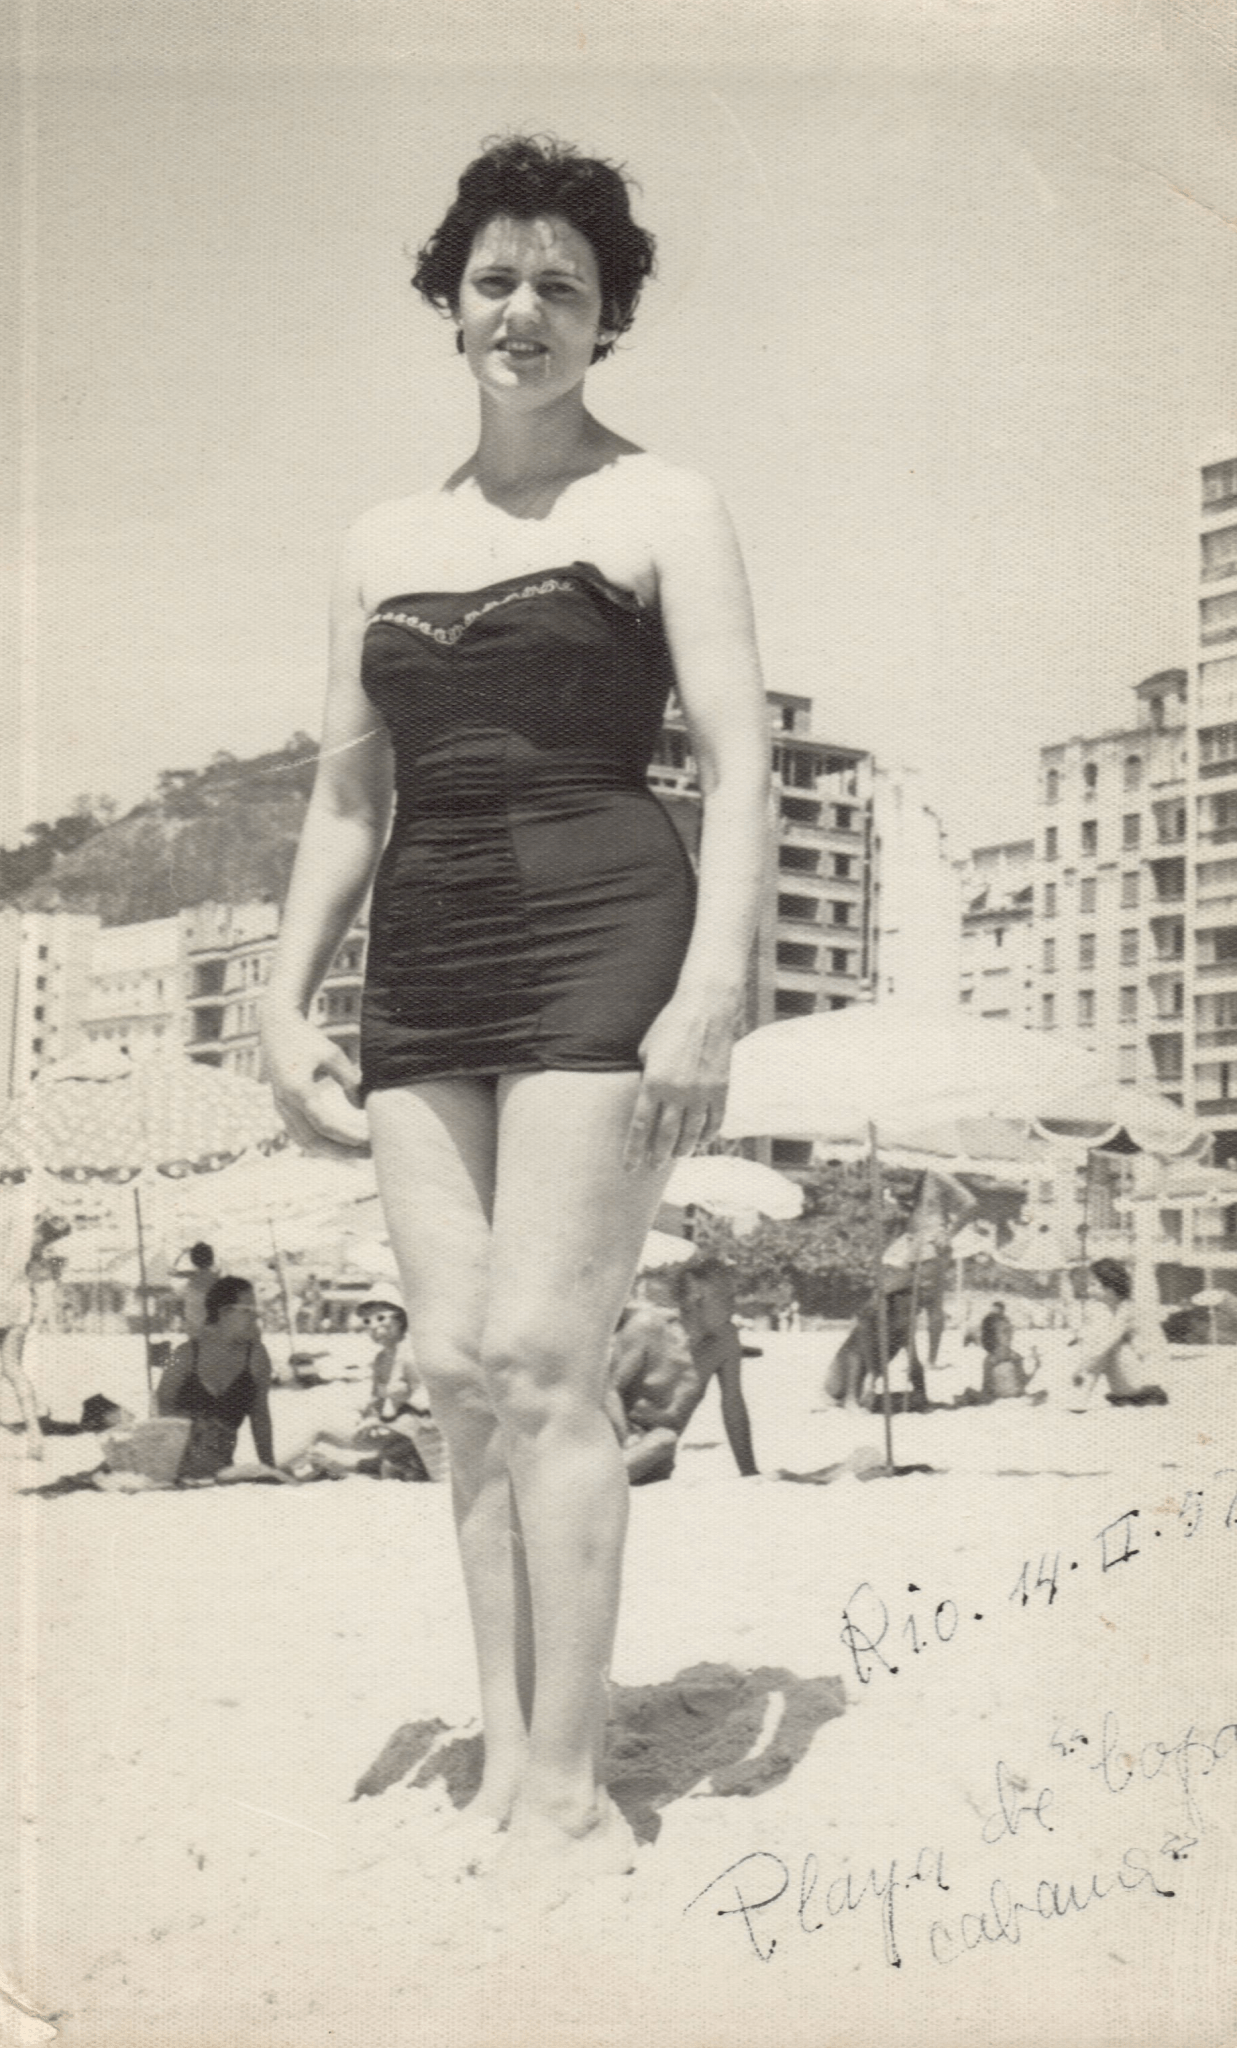 Olivia Tomé cando residía en Río